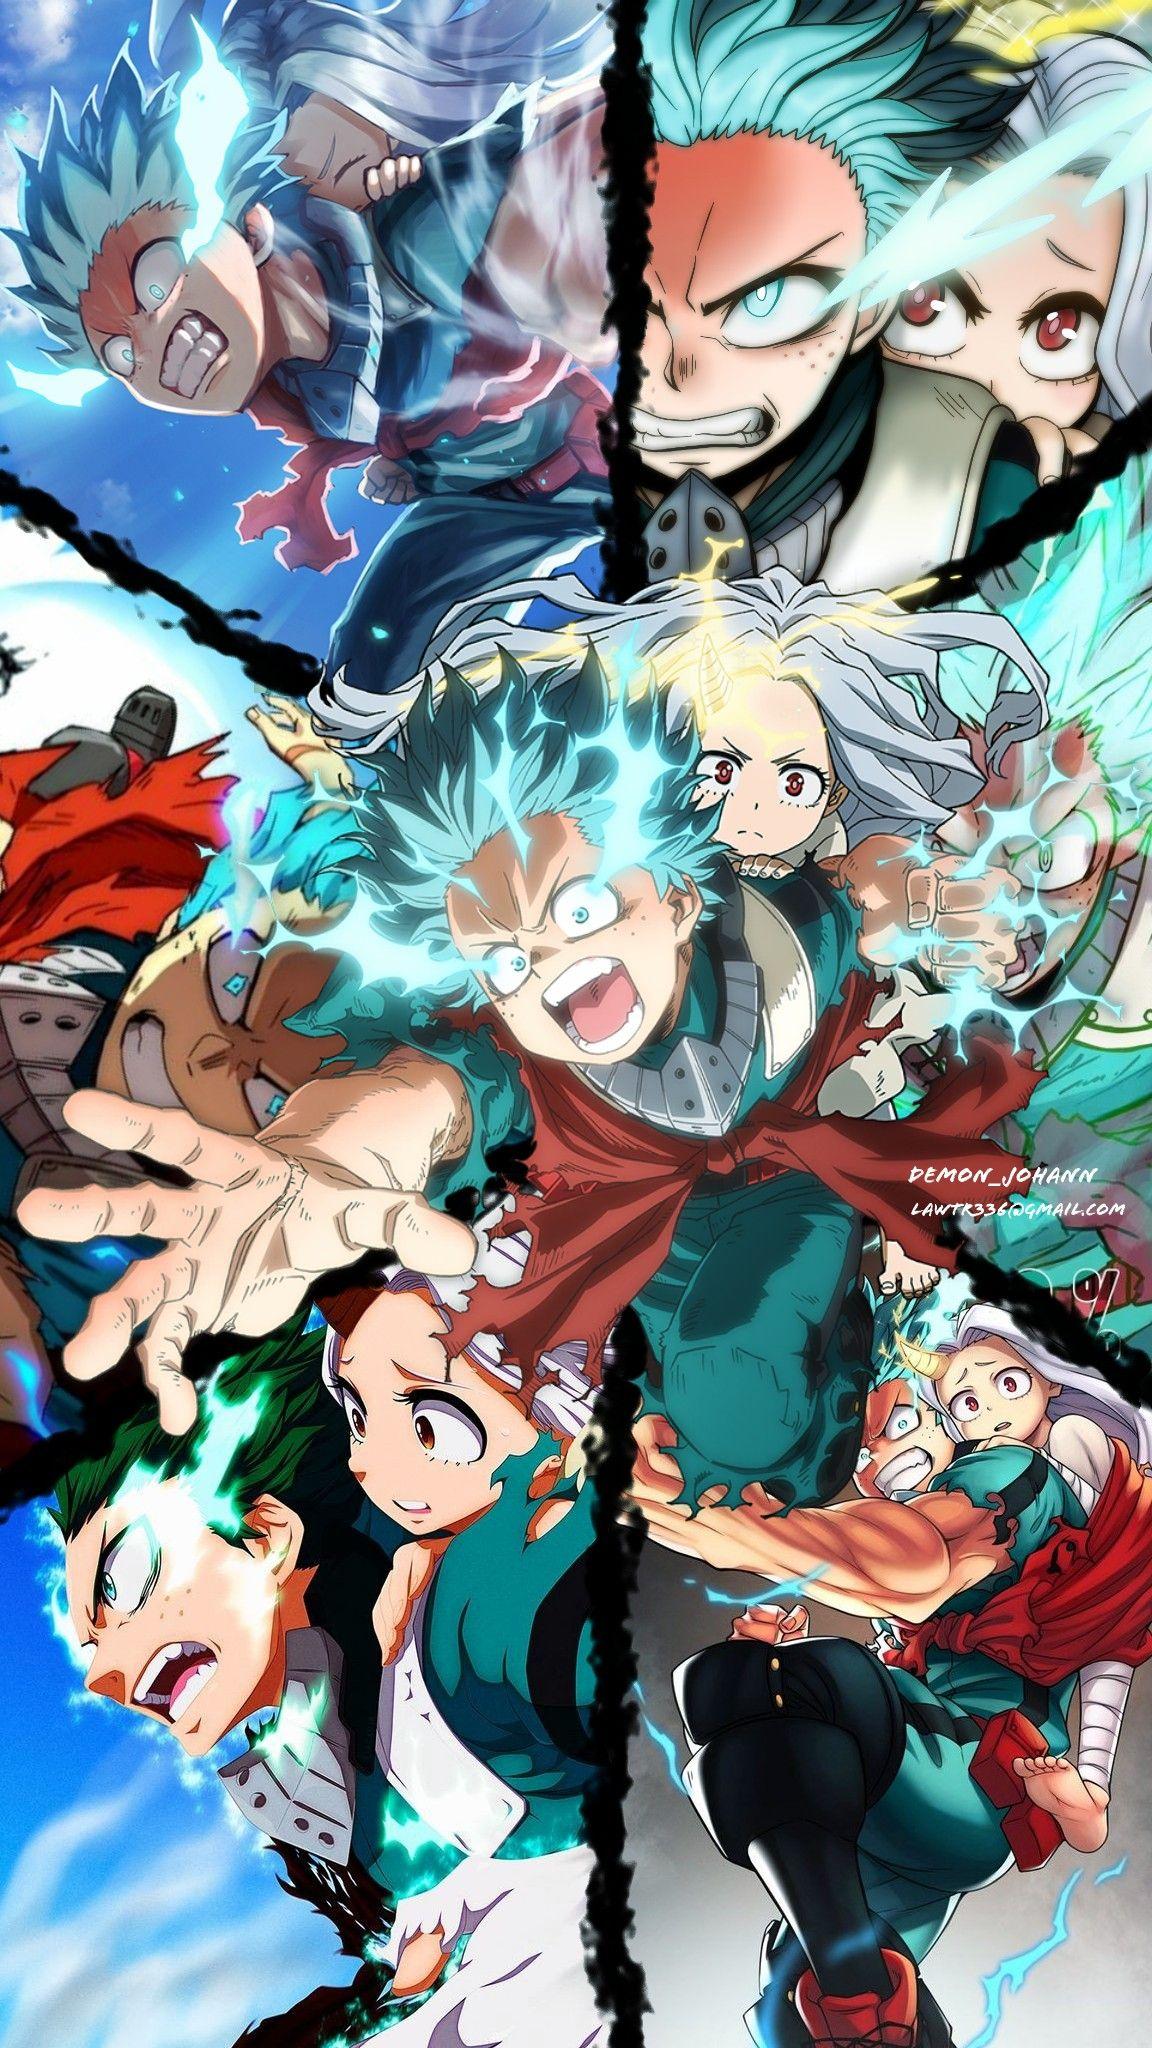 Izuku Midoriya One For All 100 My Hero Academia Boku No Hero Deku In 2020 Hero Poster Anime Wallpaper My Hero Academia Episodes